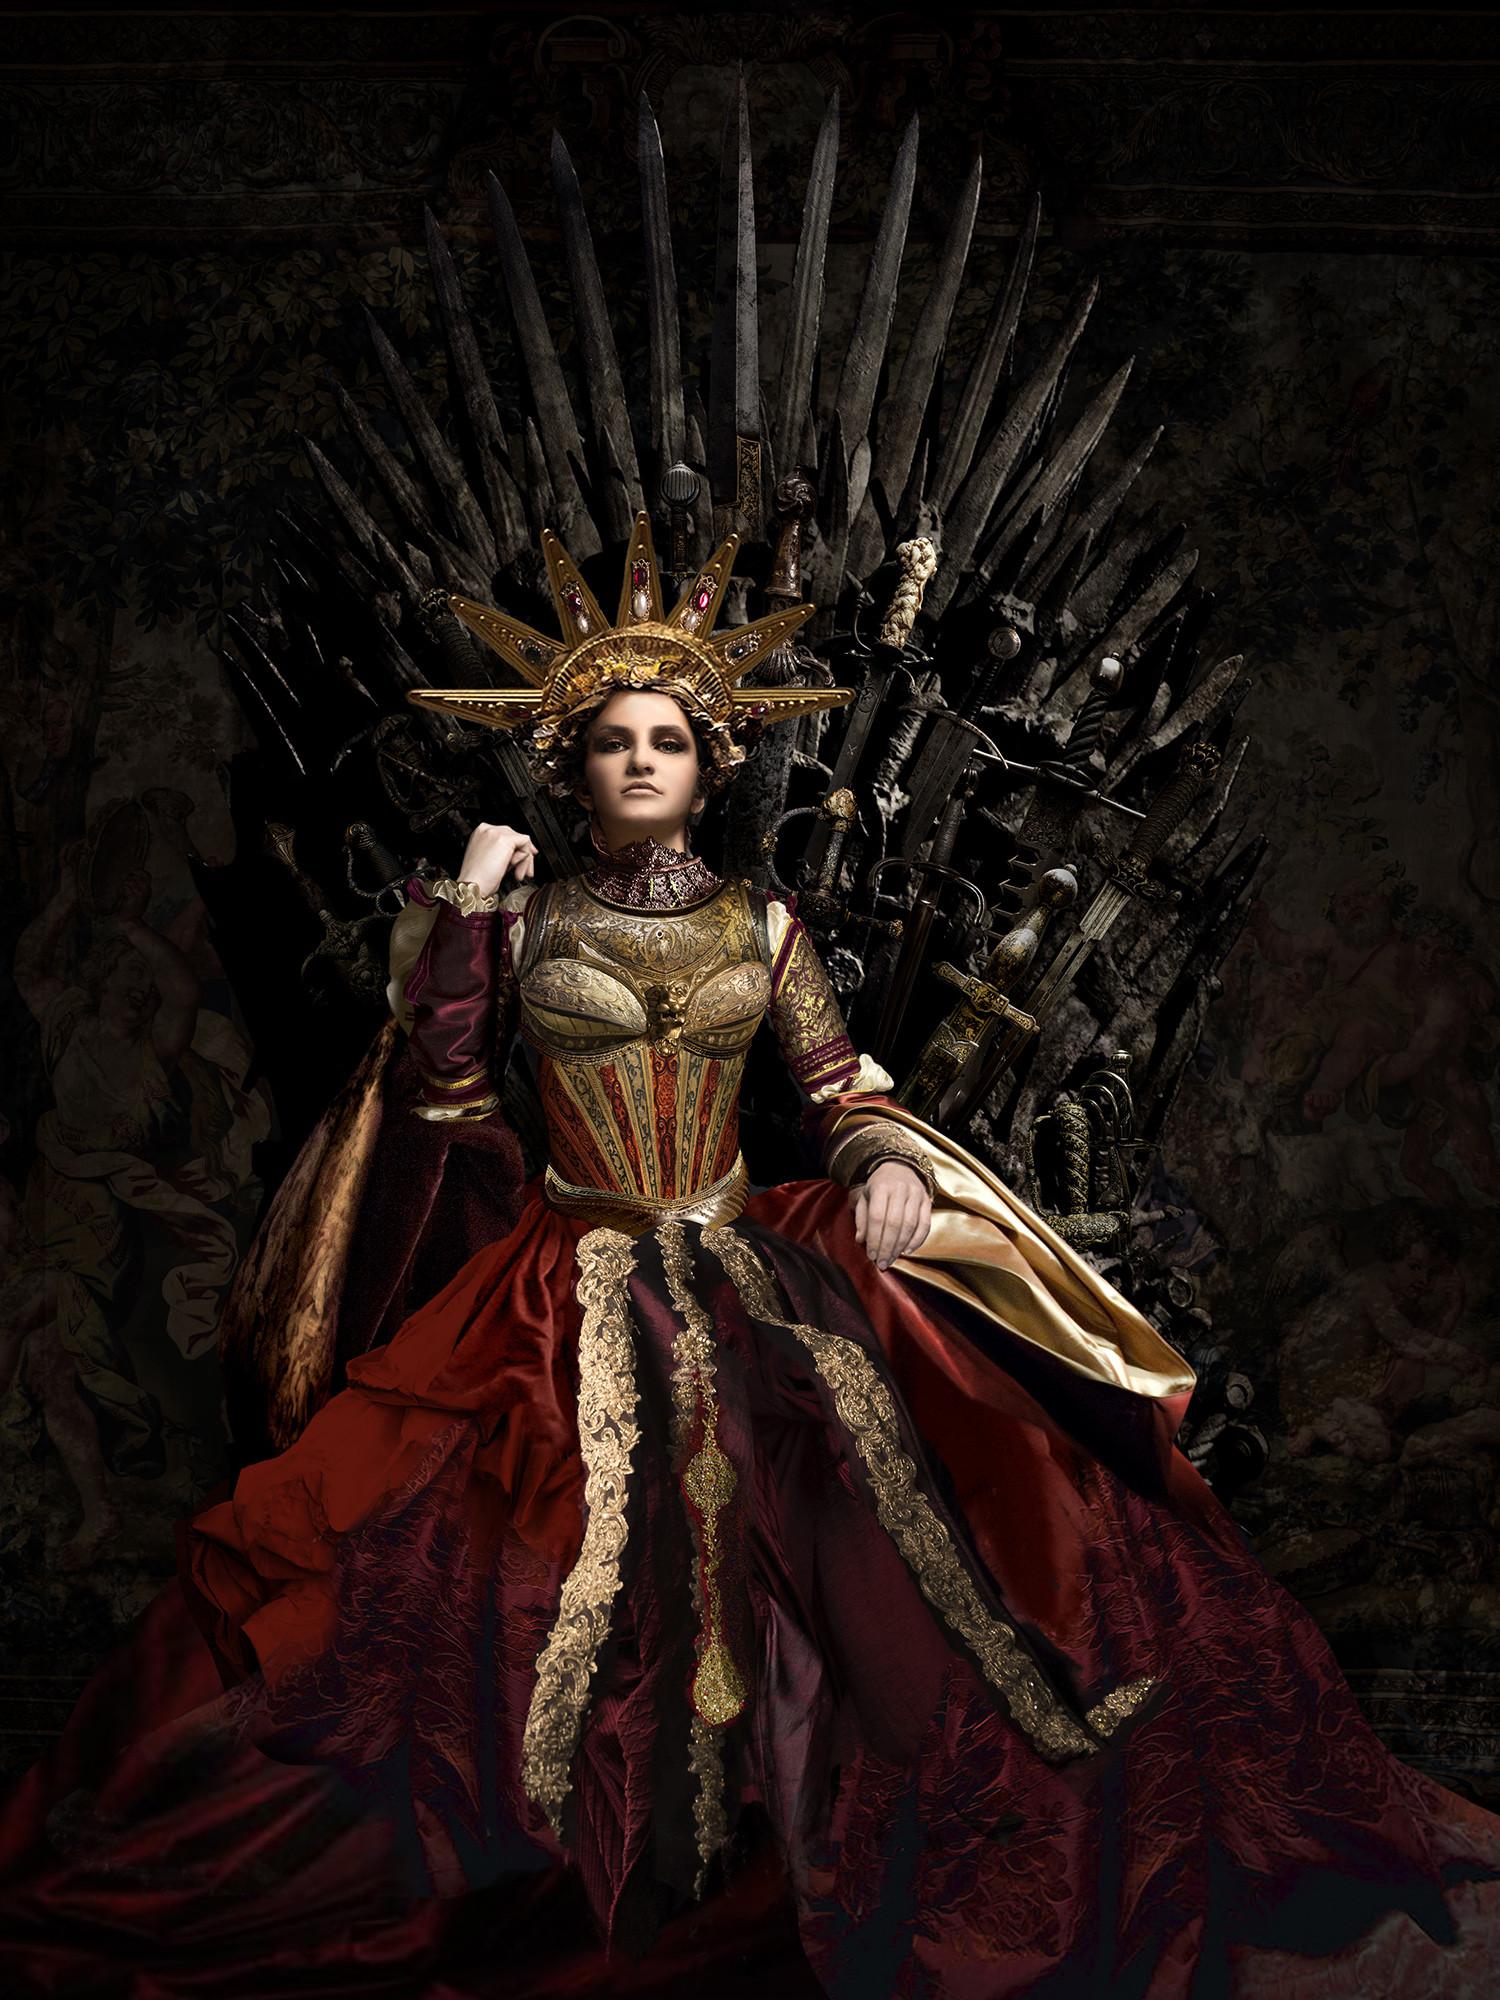 Eva kedves cersei lannister wip1